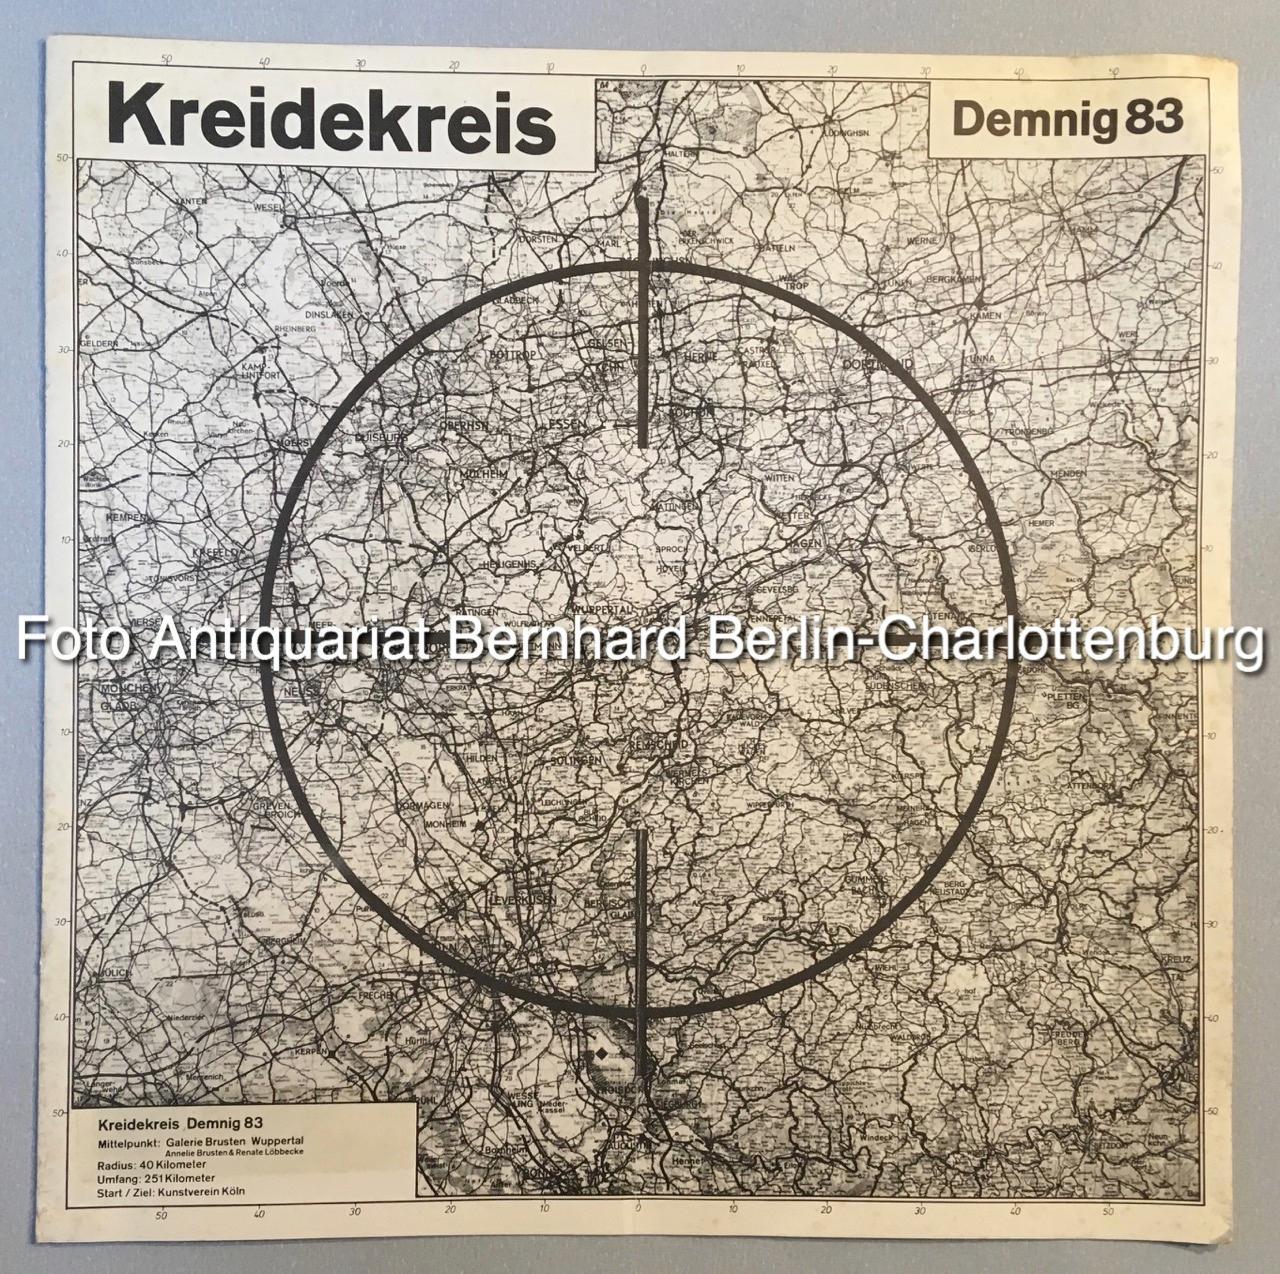 Kreidekreis Demnig 83 [dreiundachtzig] (Katalog und Karte: Demnig, Gunter